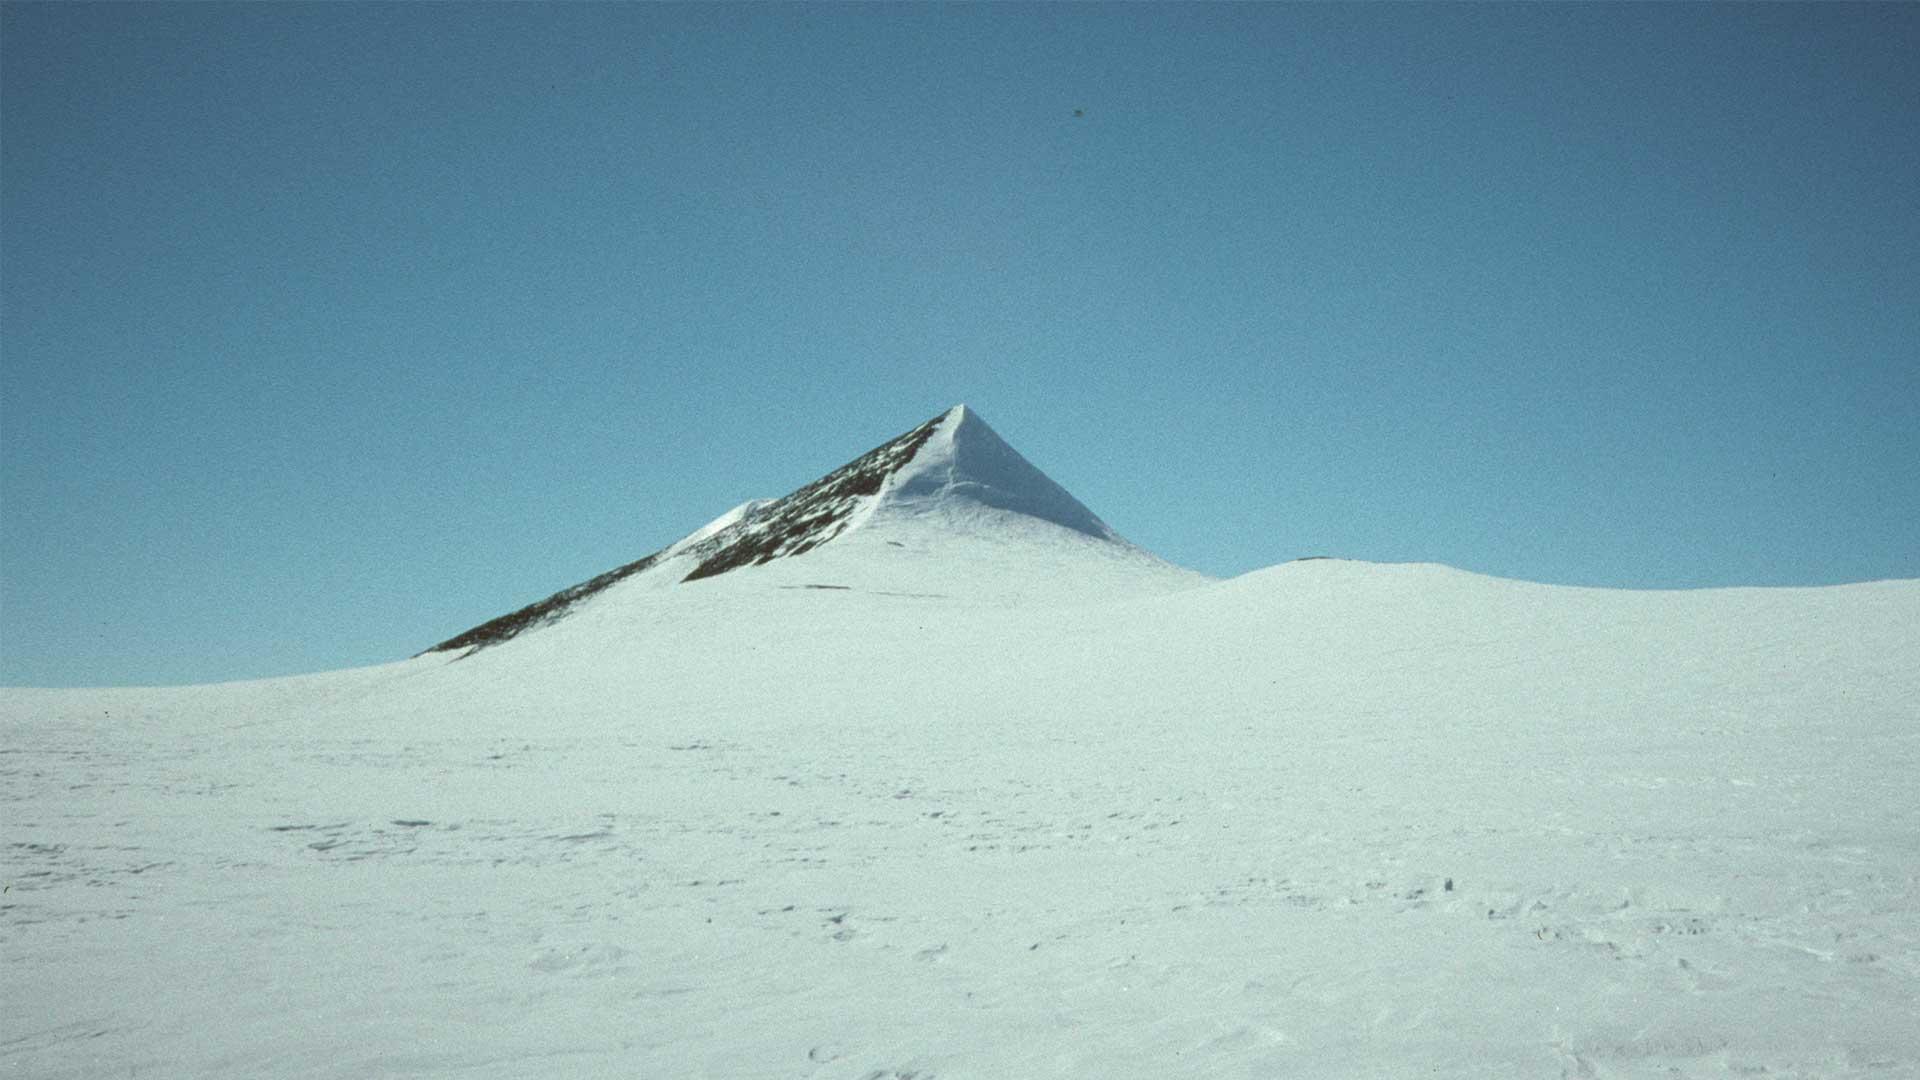 nunatak piramide antartide